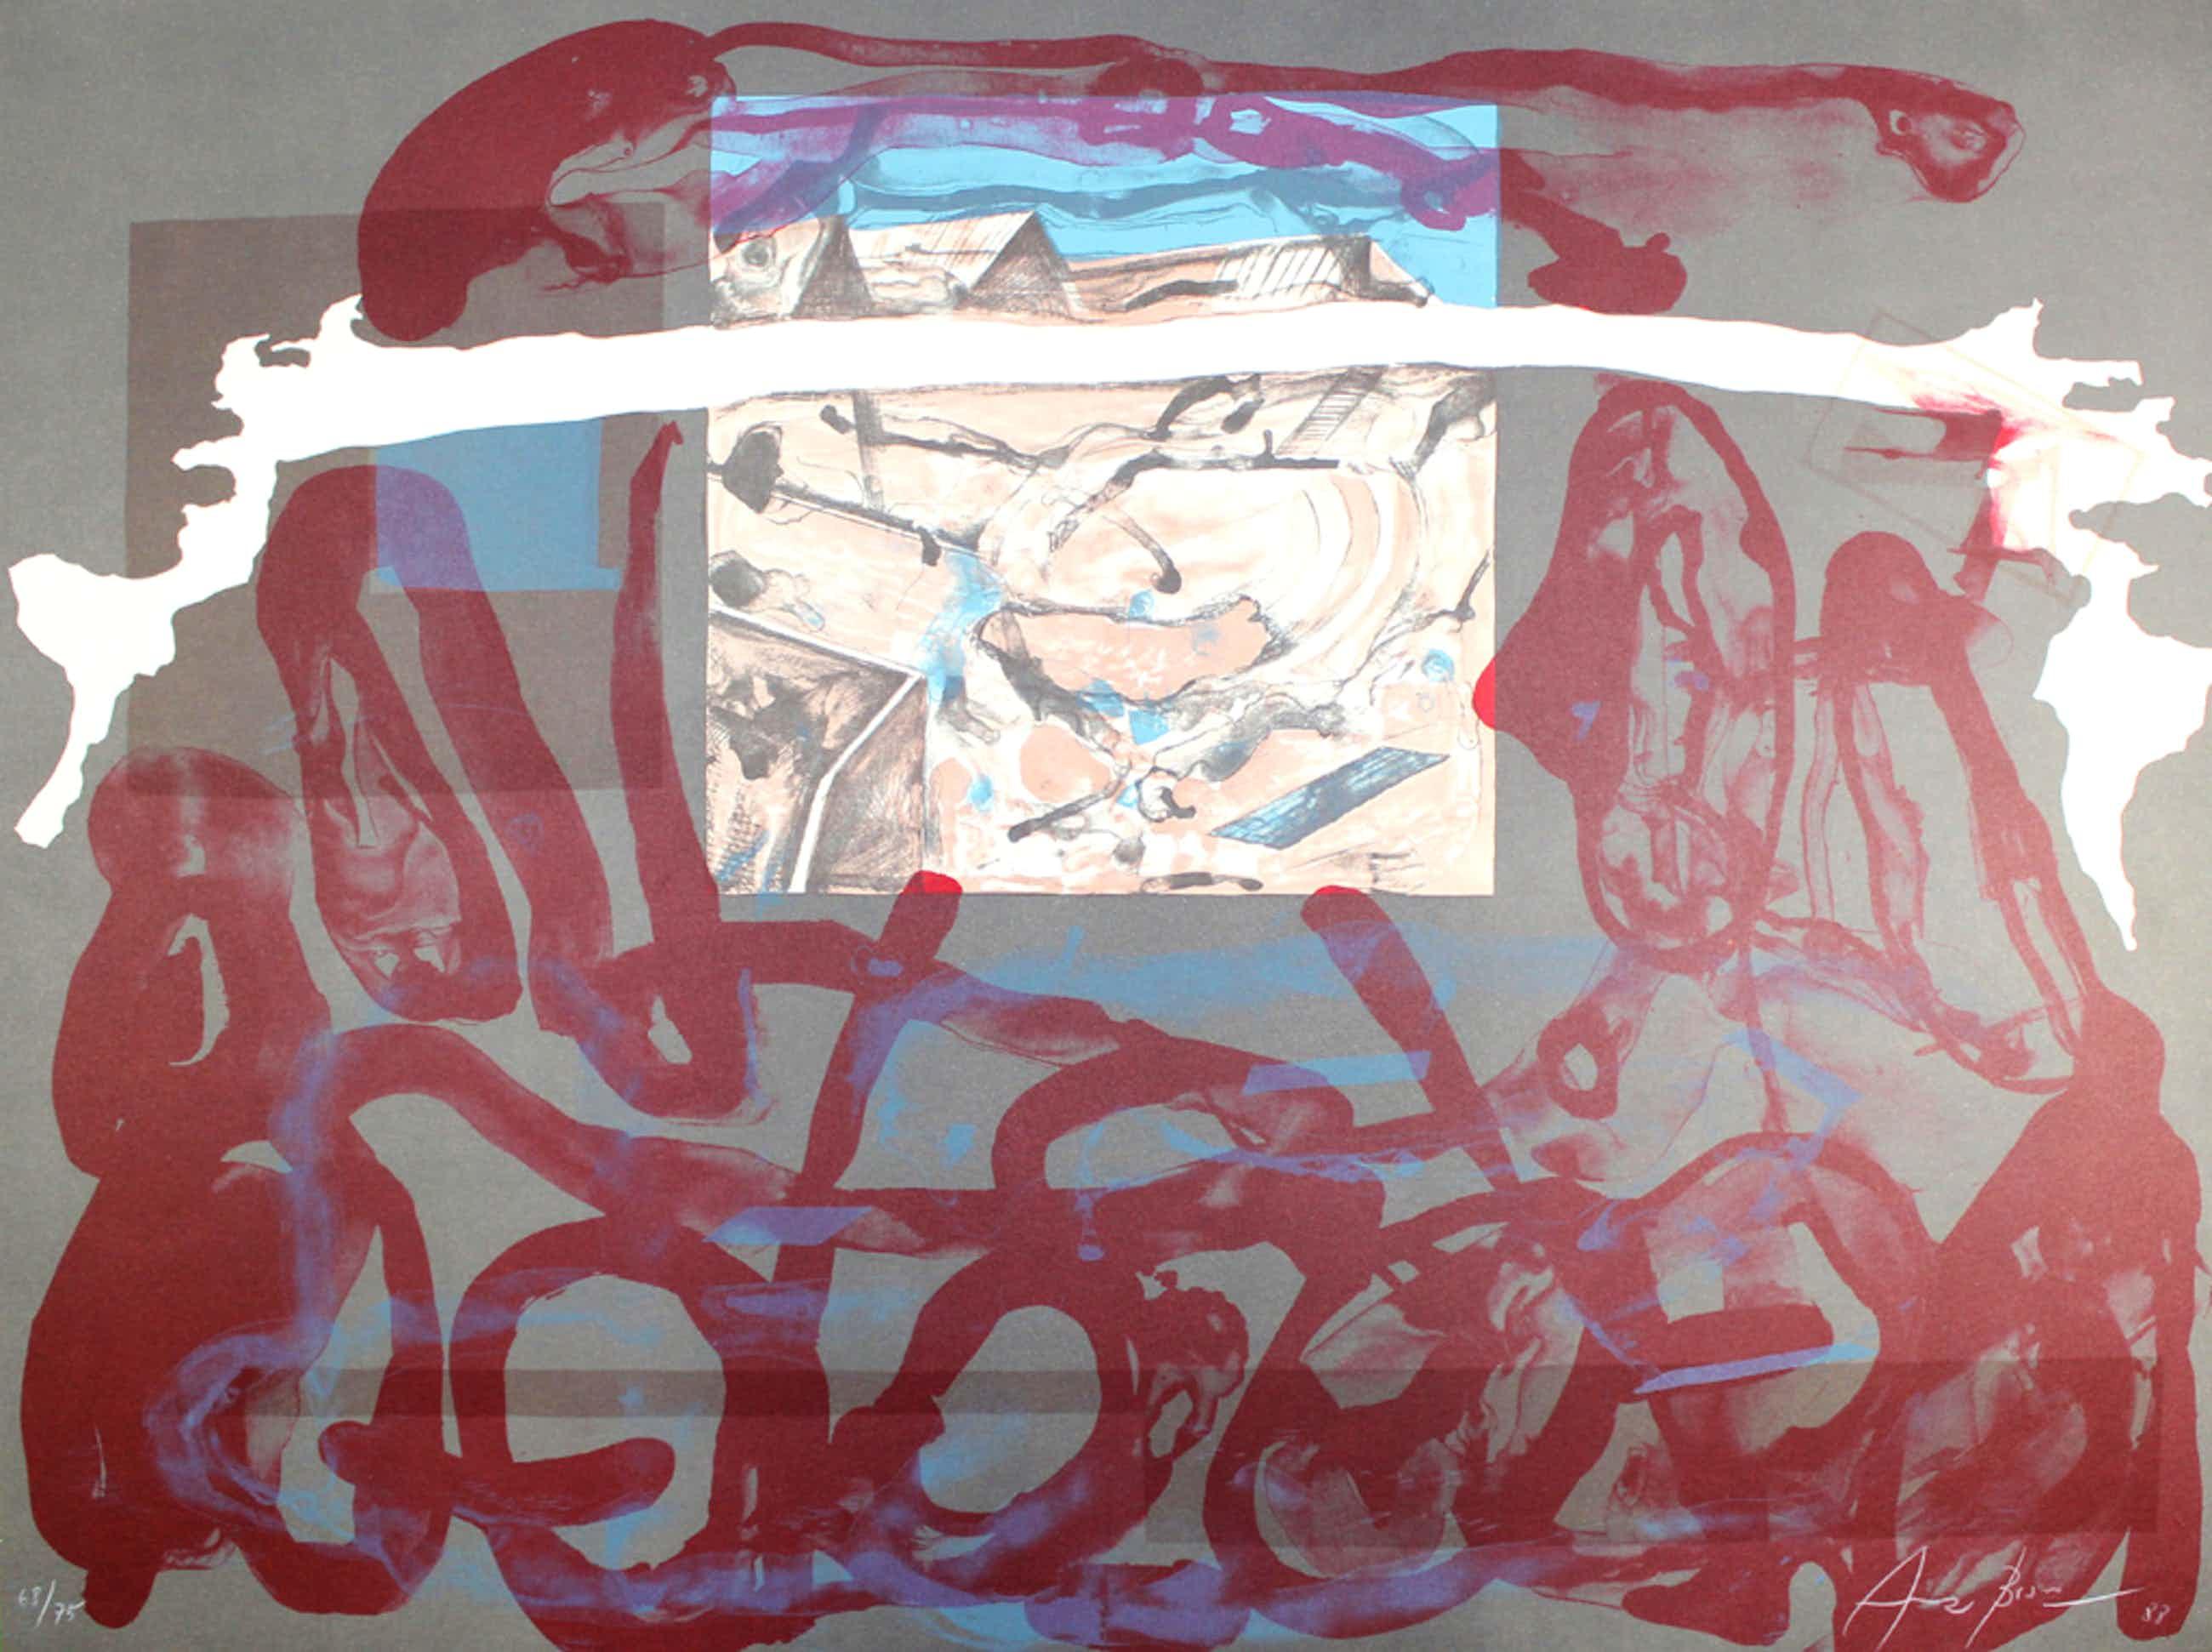 Eduardo Arranz-Bravo - Casa con azul e blanca kopen? Bied vanaf 95!